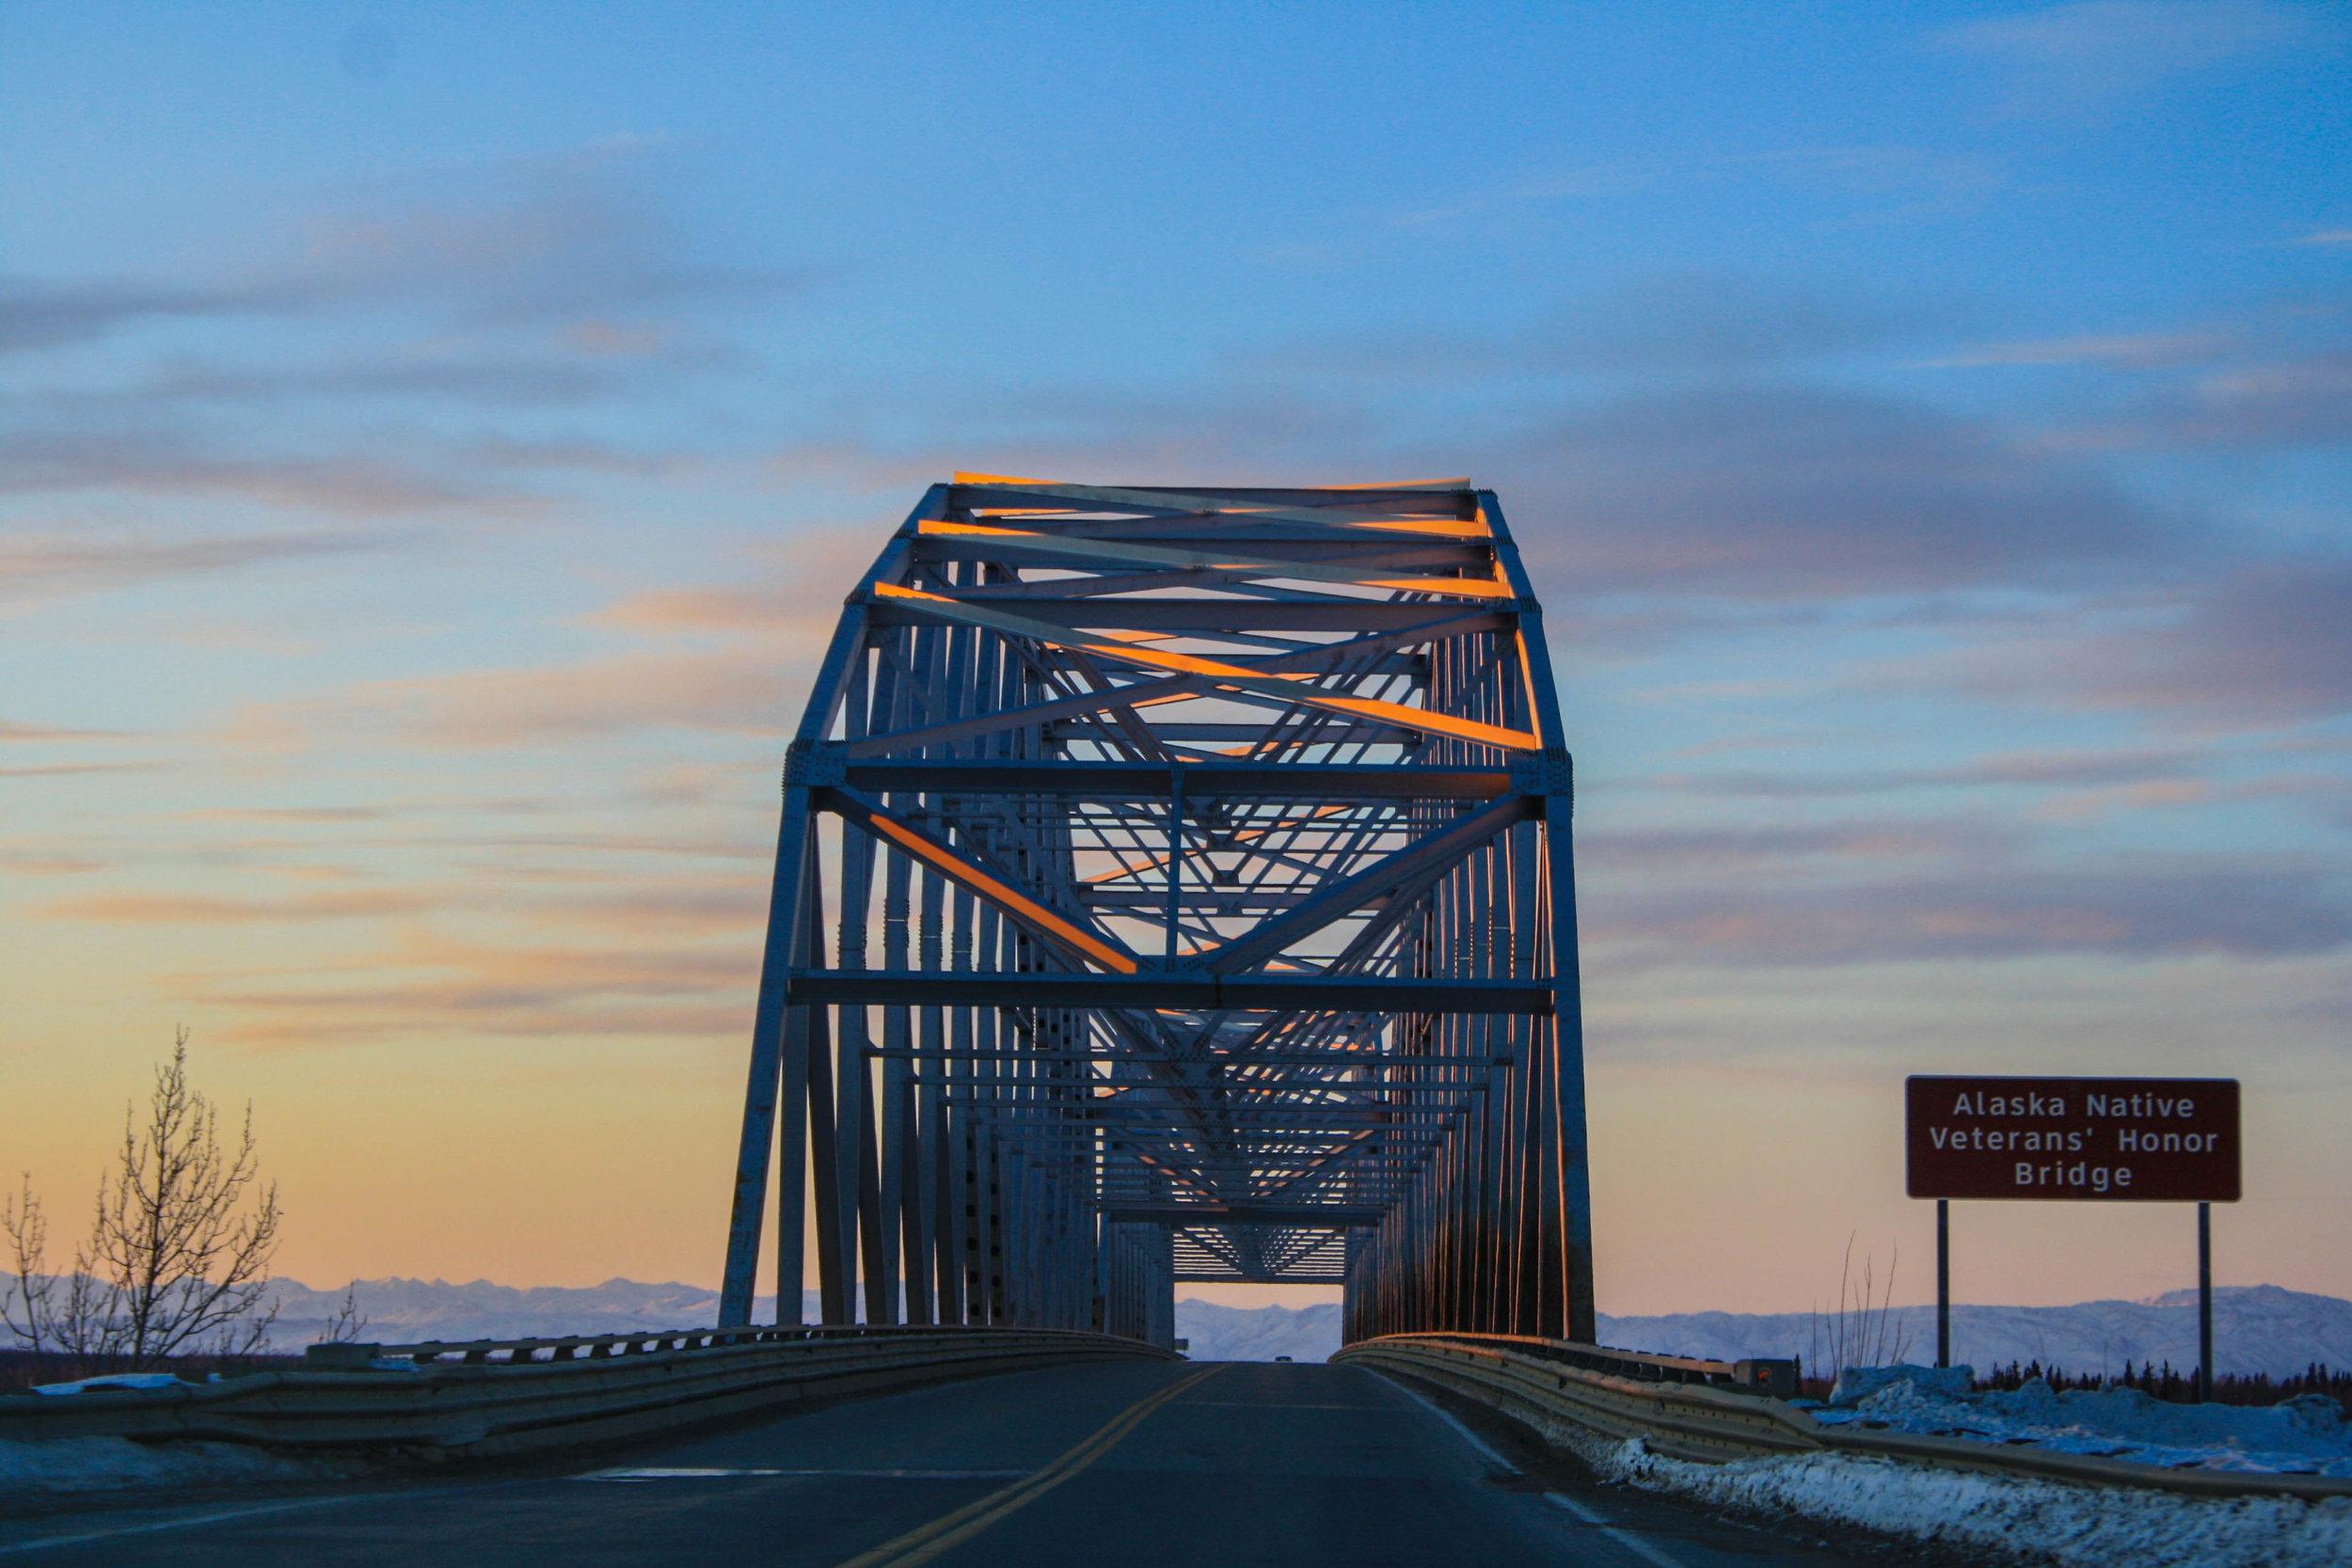 Alaska Native Veterans' Honor Bridge, Alaska. Mars 2013